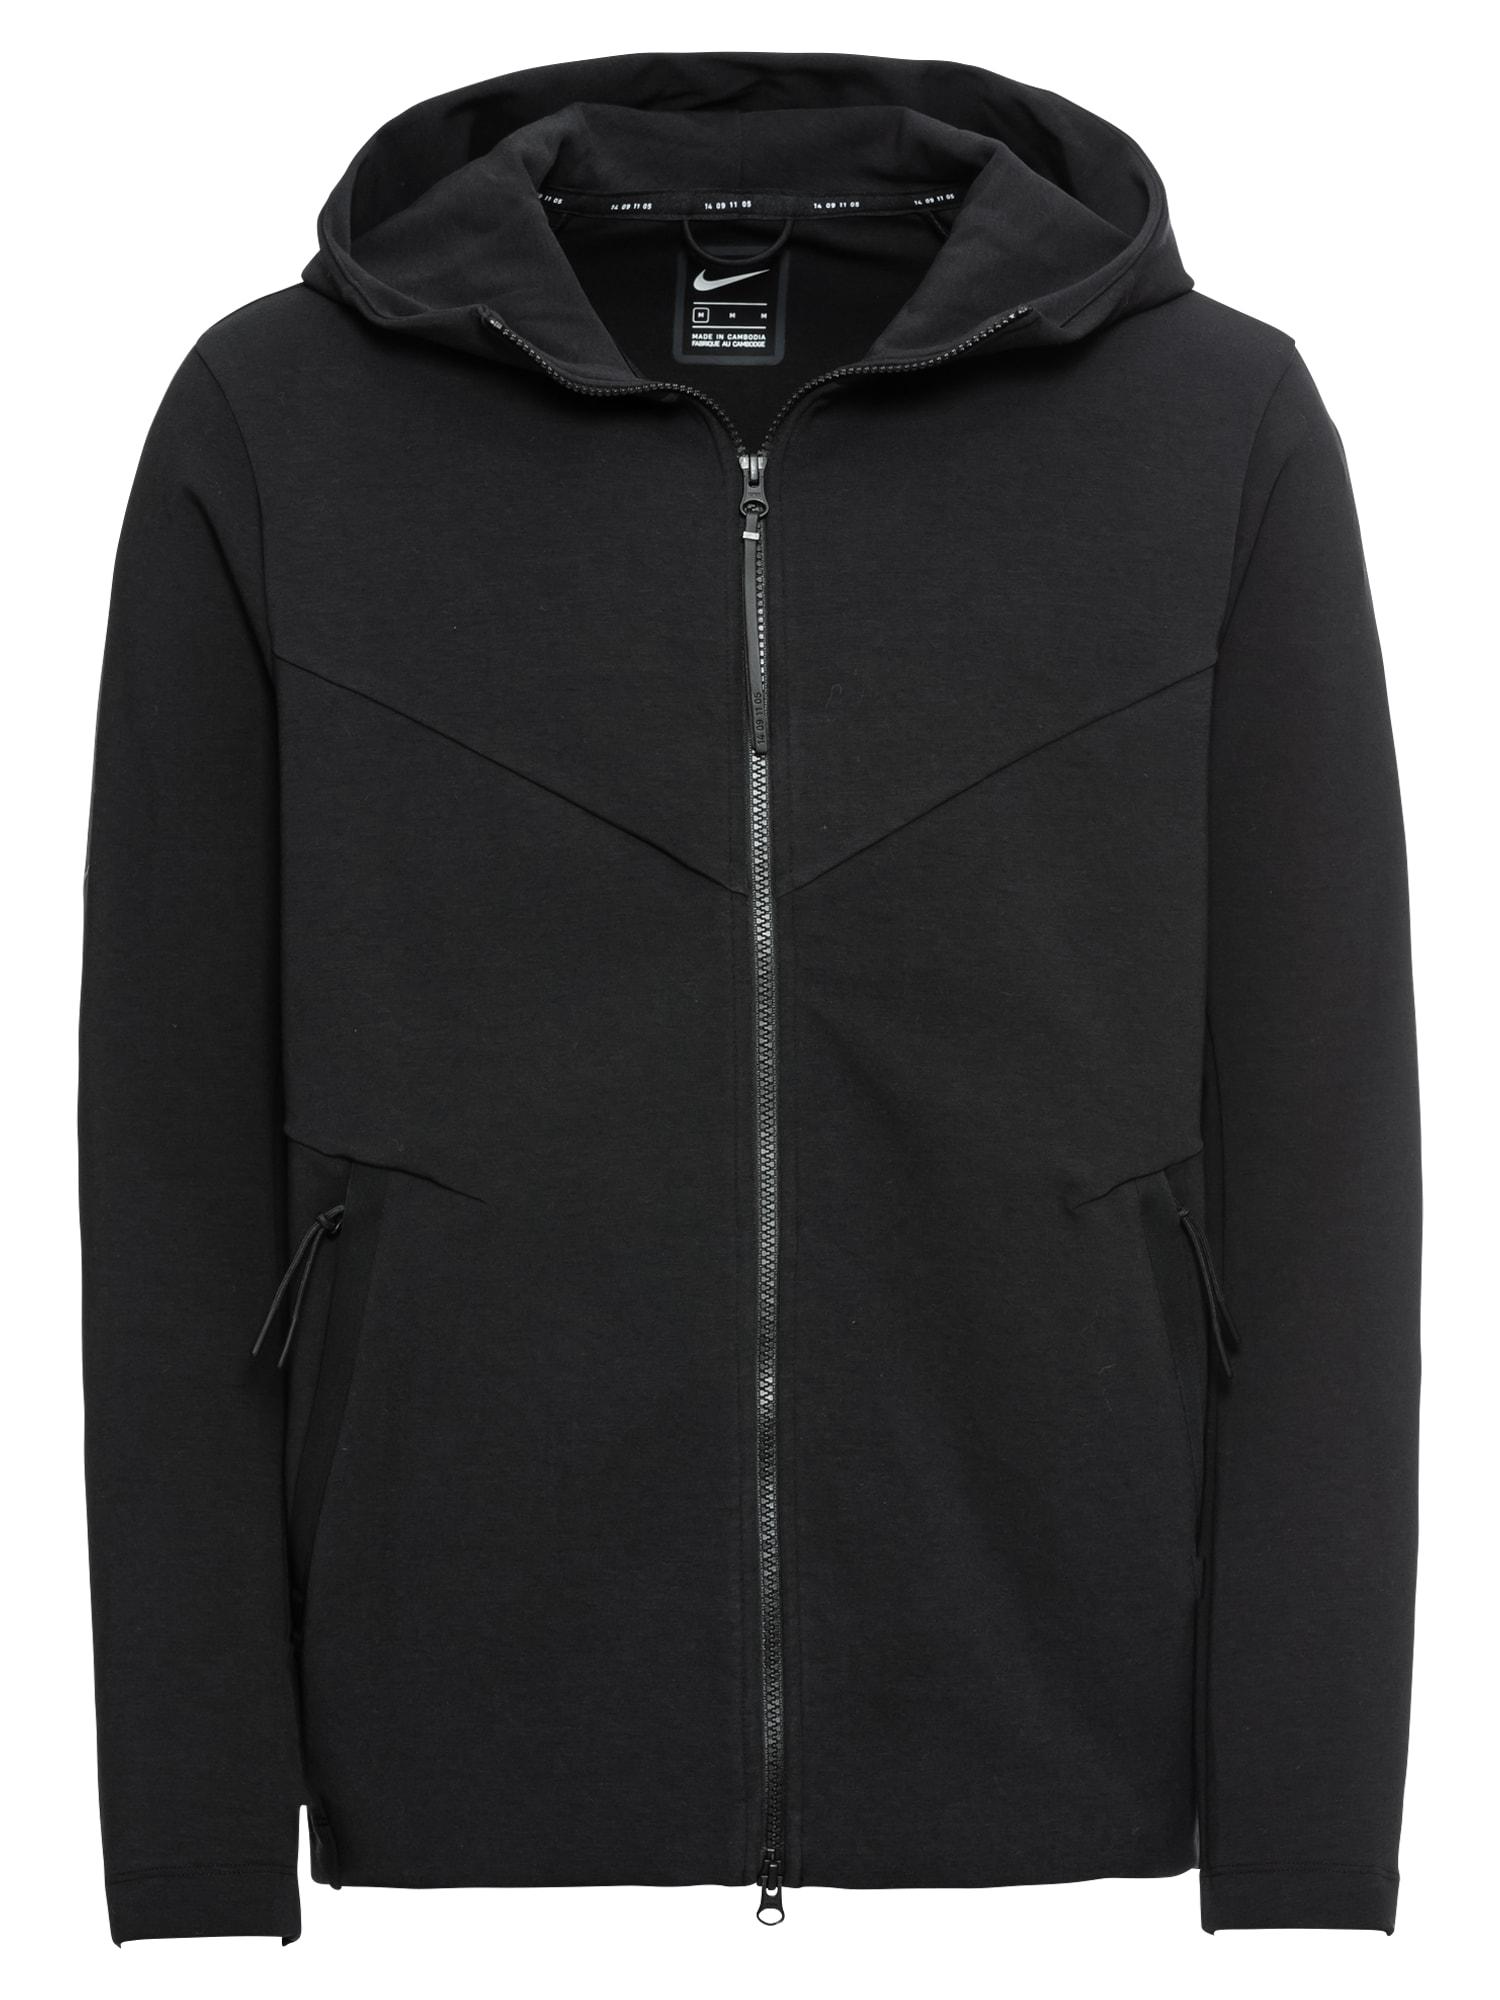 Přechodná bunda M NSW TCH PCK HOODIE FZ KNIT černá Nike Sportswear